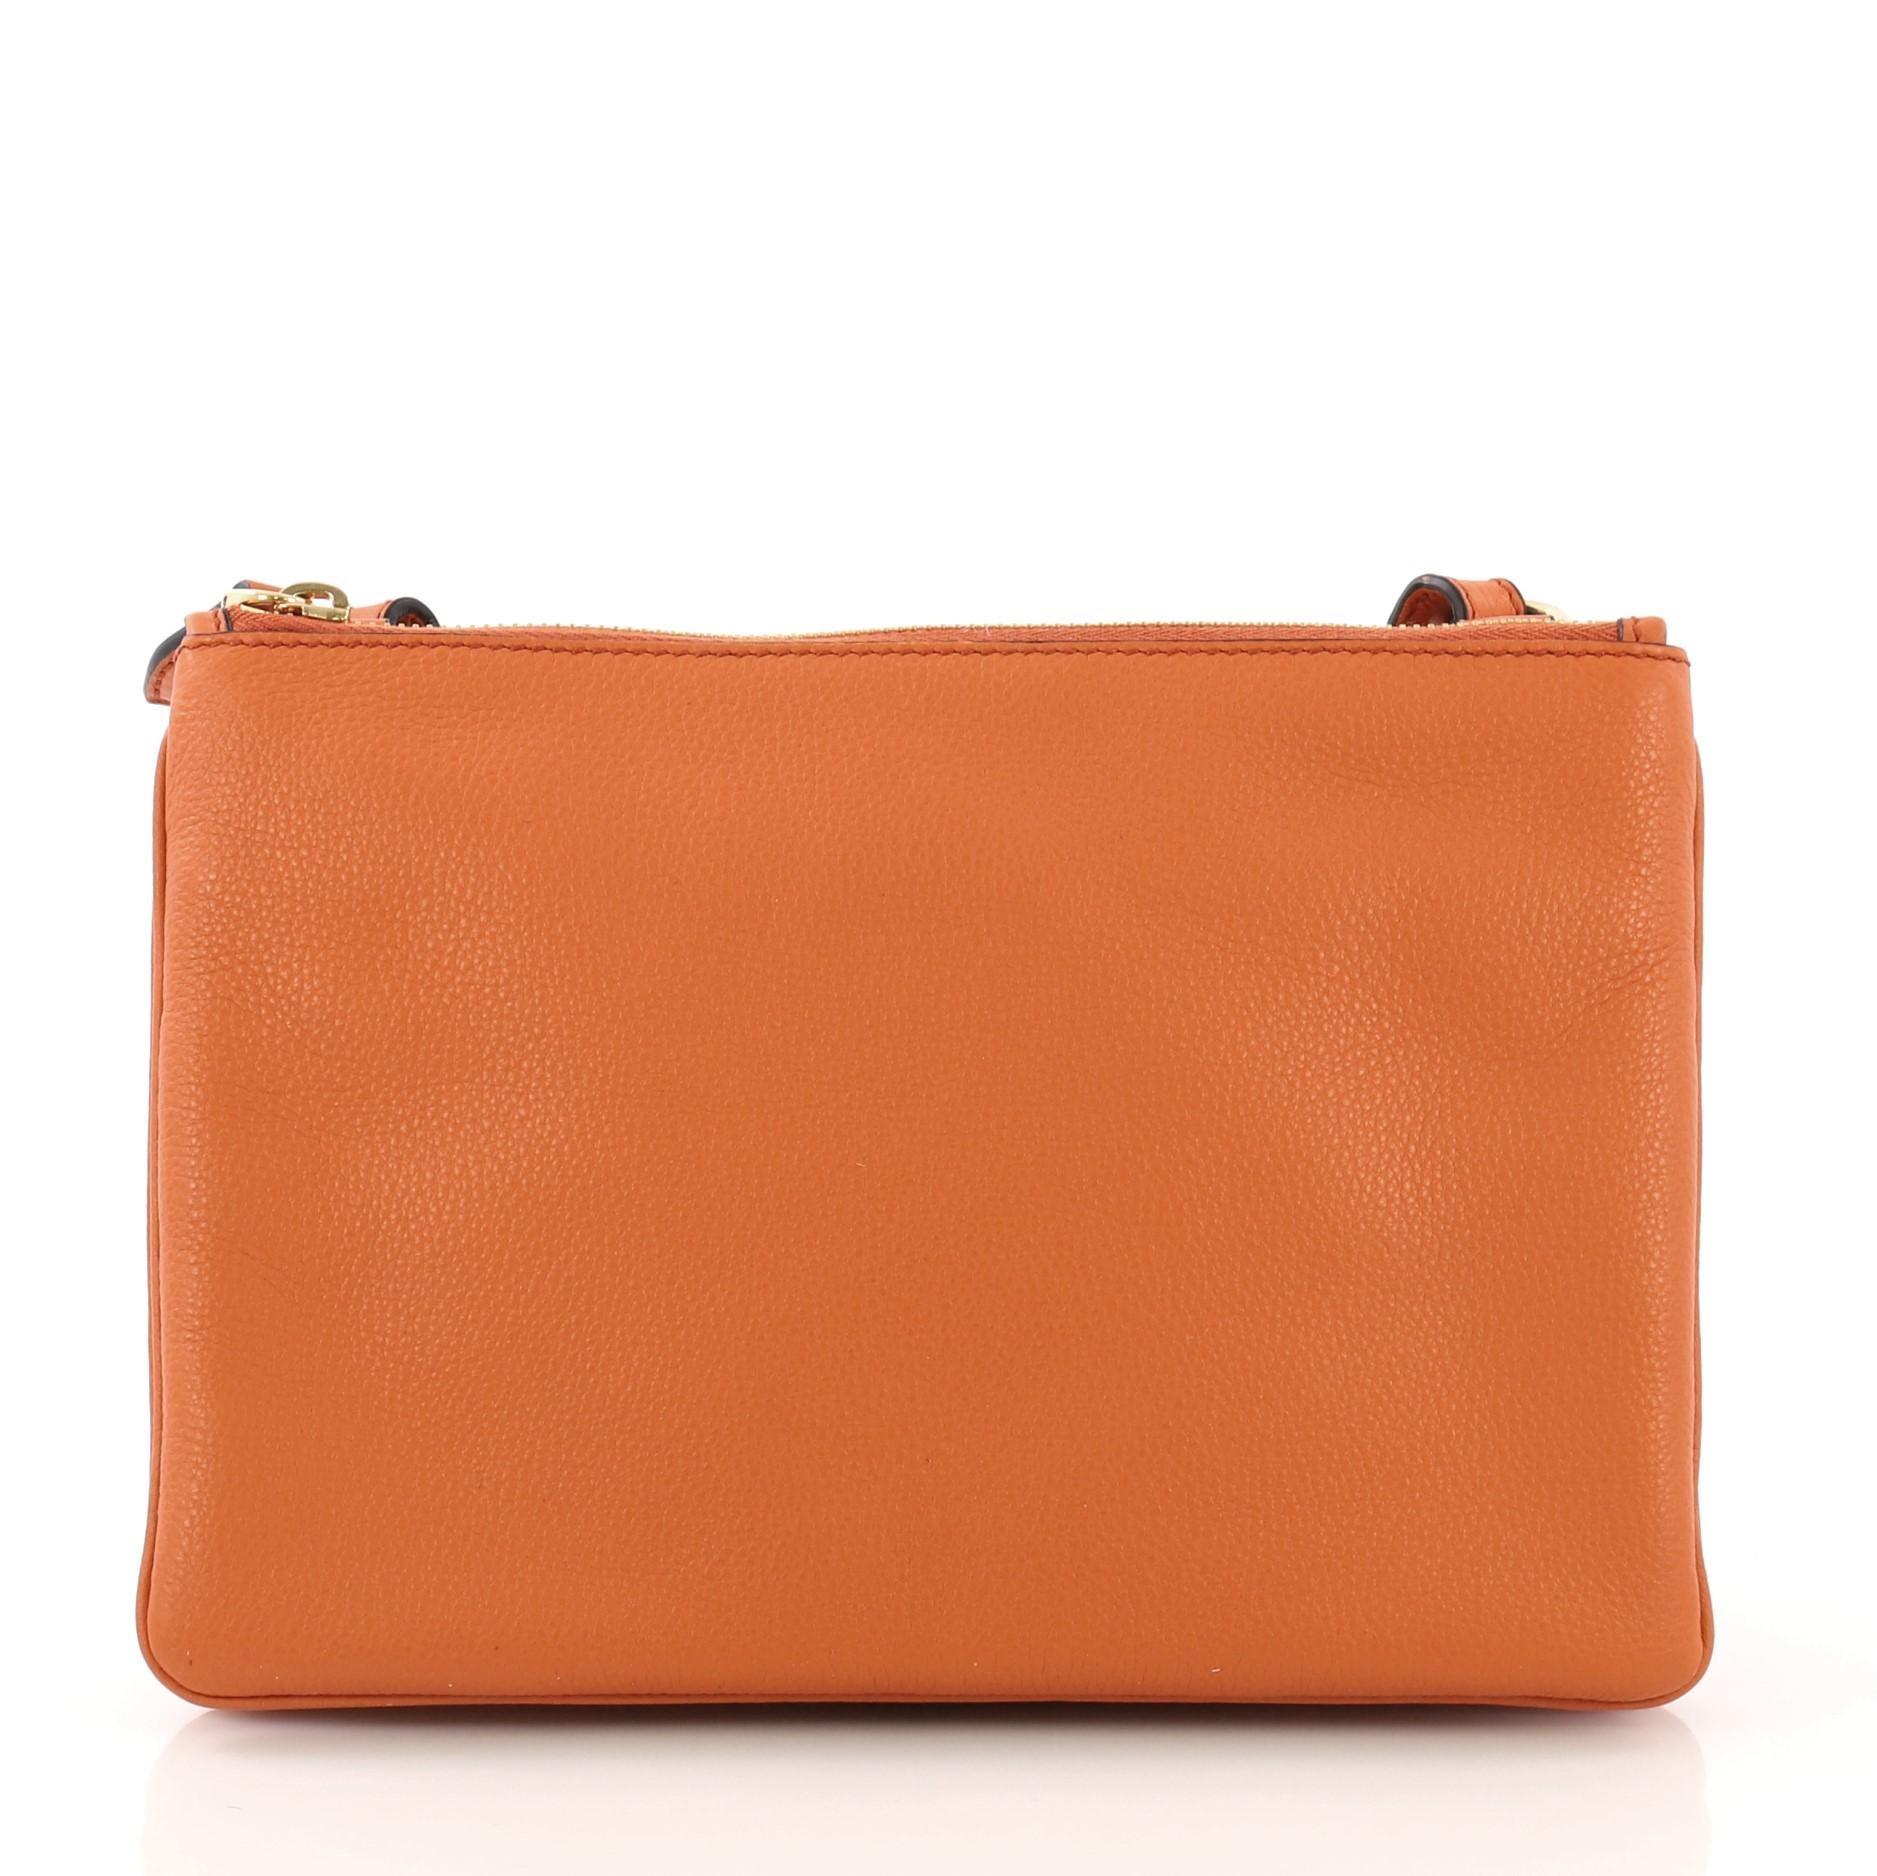 4da5a5a367d3 Prada Double Zip Crossbody Bag Vitello Phenix Small For Sale at 1stdibs